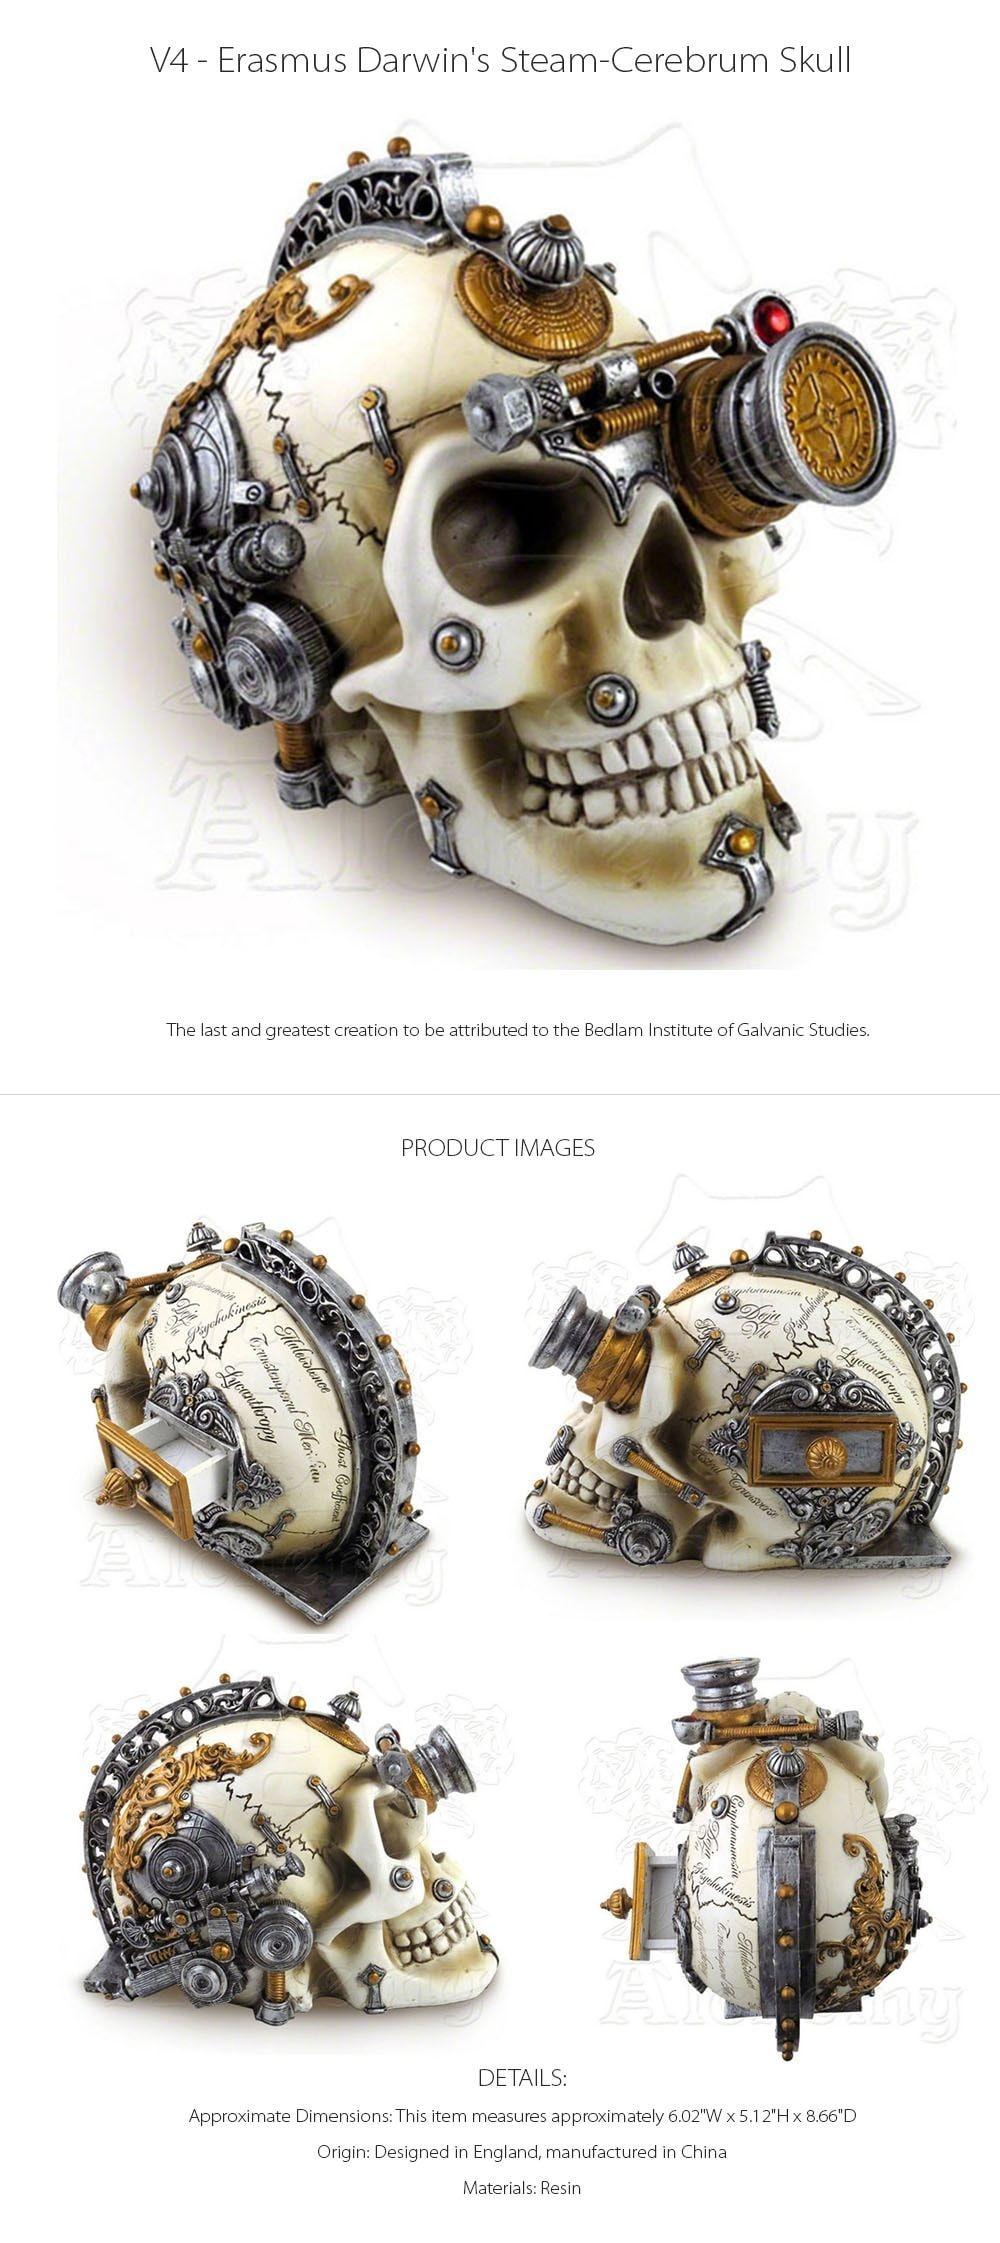 Erasmus Darwin's Steam-Cerebrum Skull Decorative Skull with Hidden Compartment